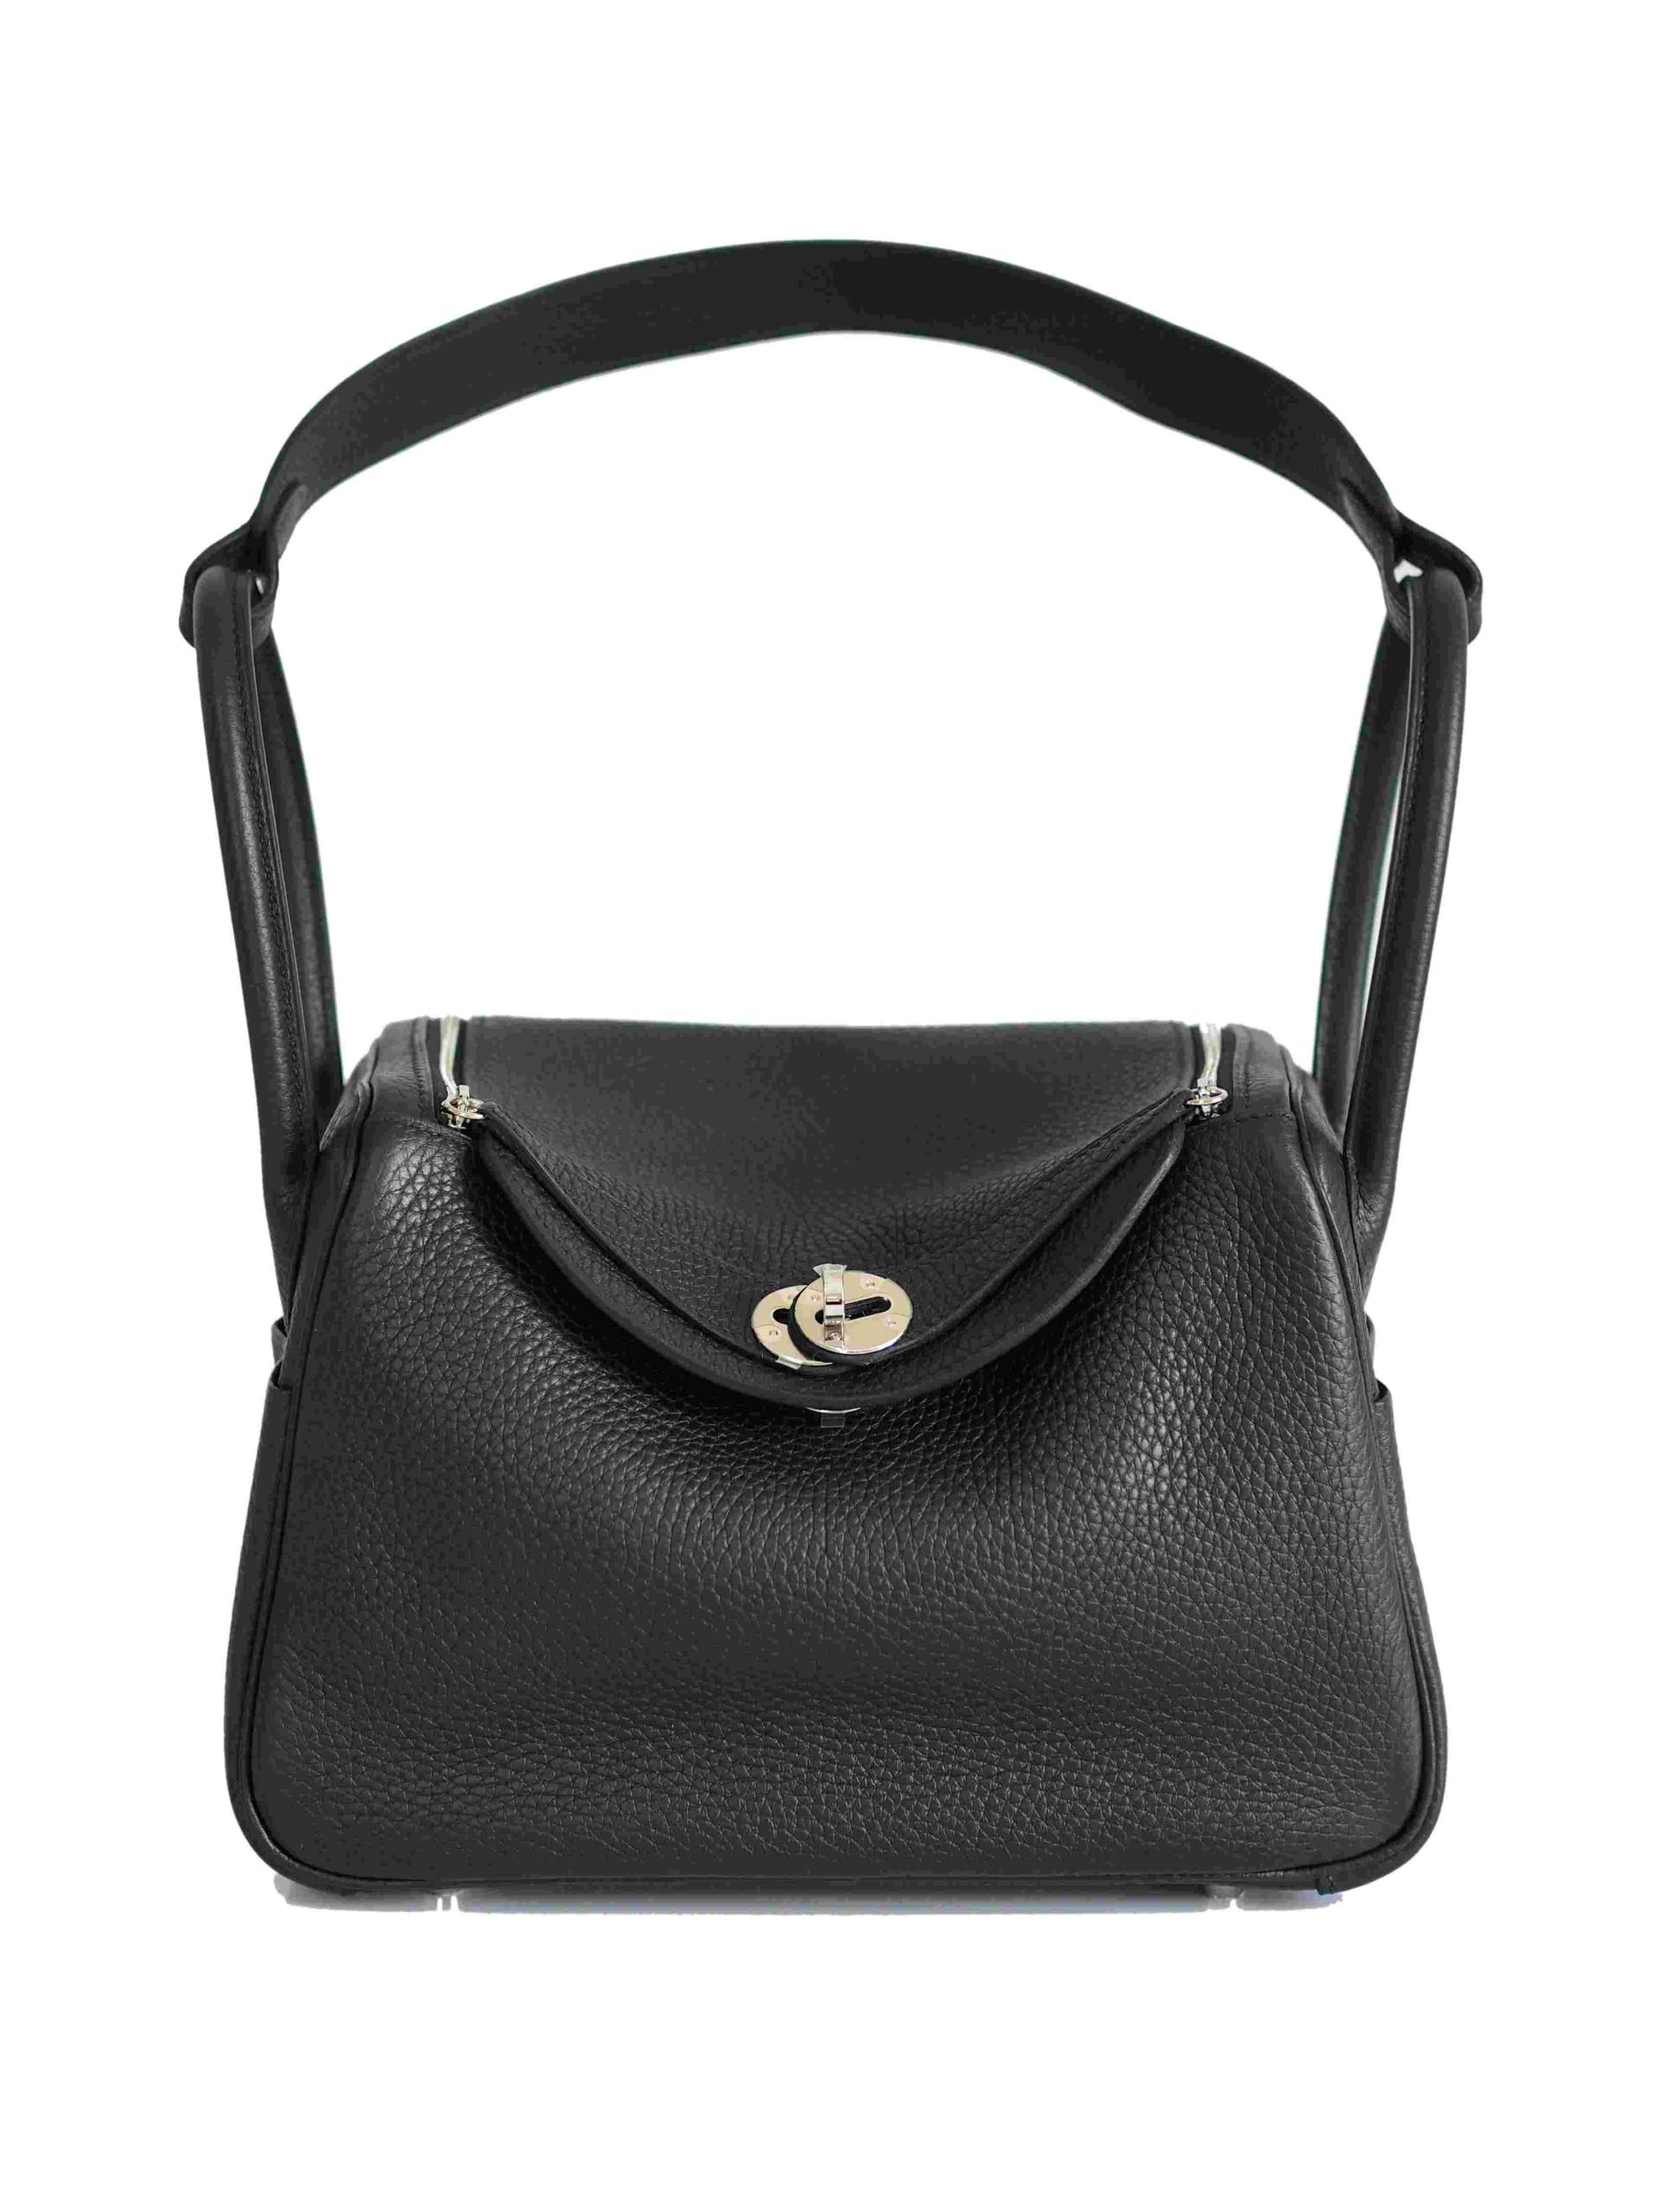 Bag HERMES Lindy 26 Taurillon Clemence Noir PHW